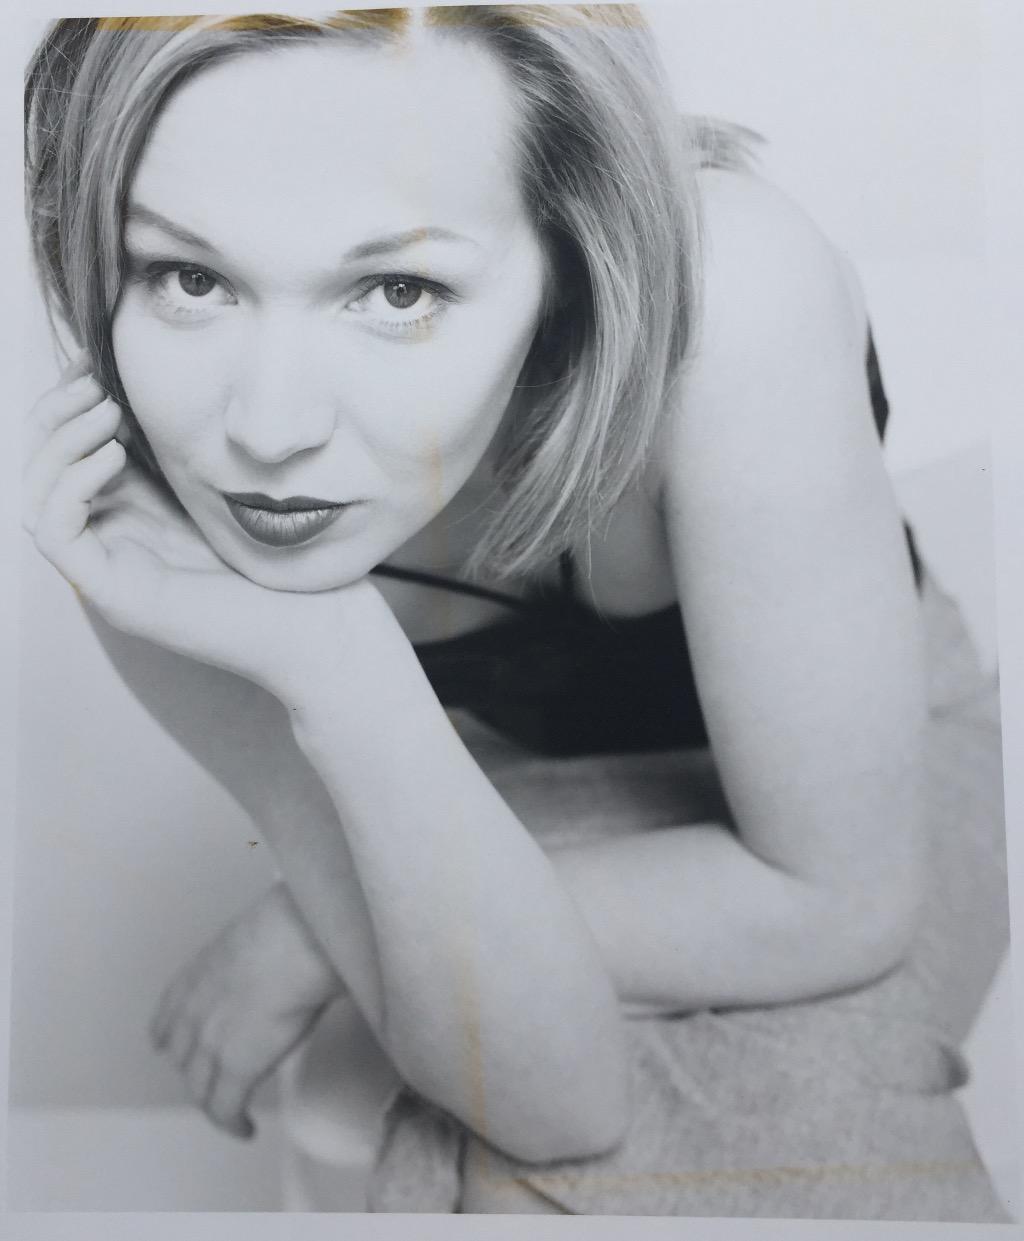 Anna Shaffer,Naomi Scott Adult videos Countess Vaughn,Padmini